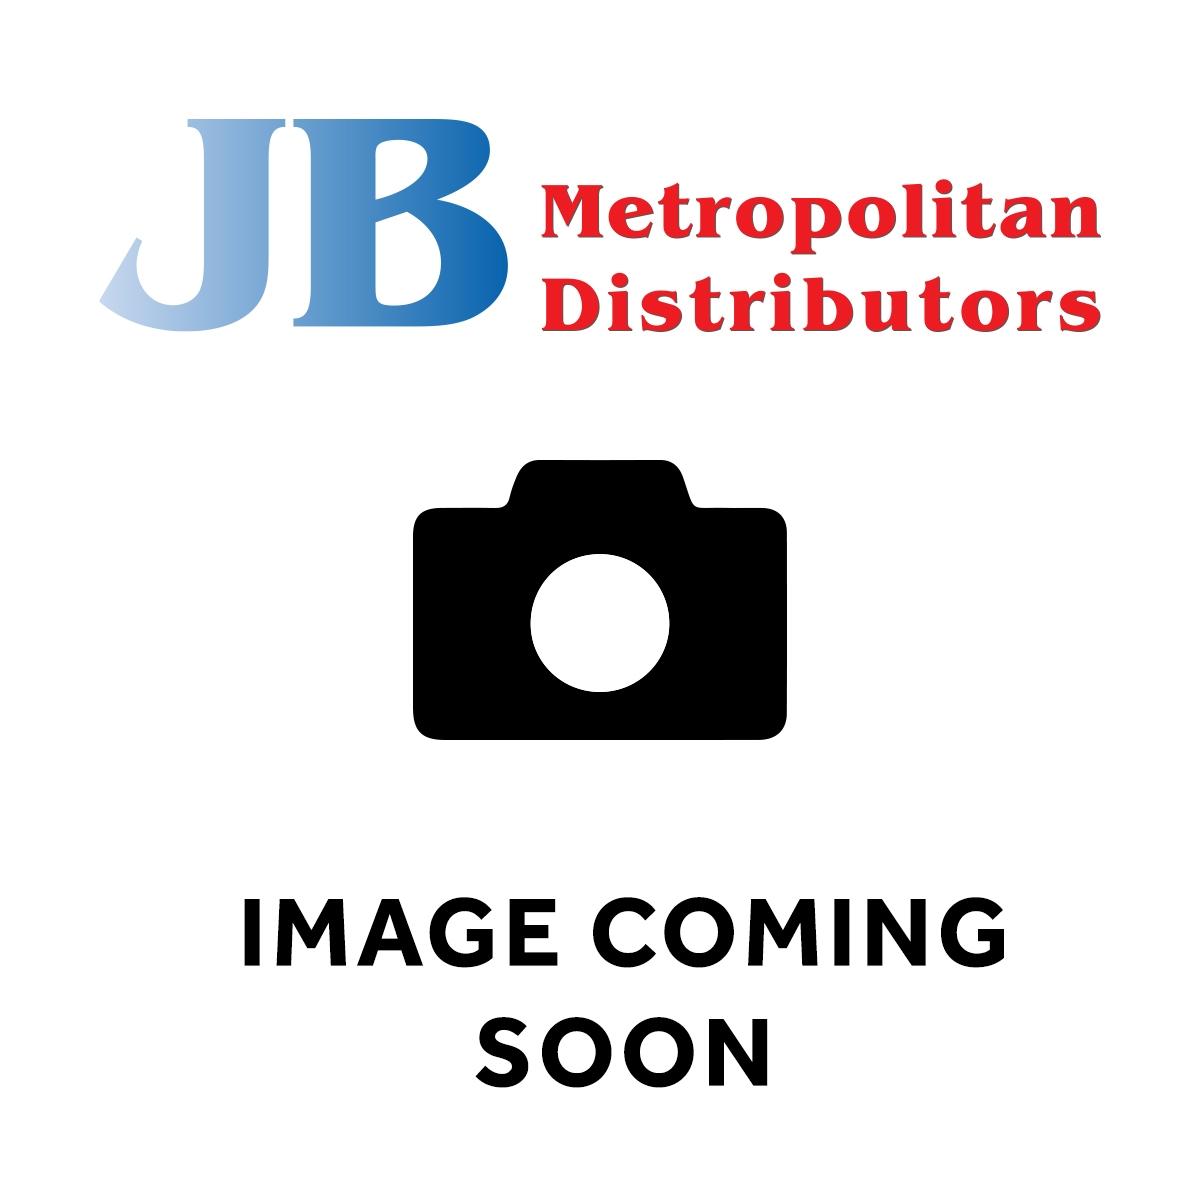 200G NUTRI GRAIN CEREAL